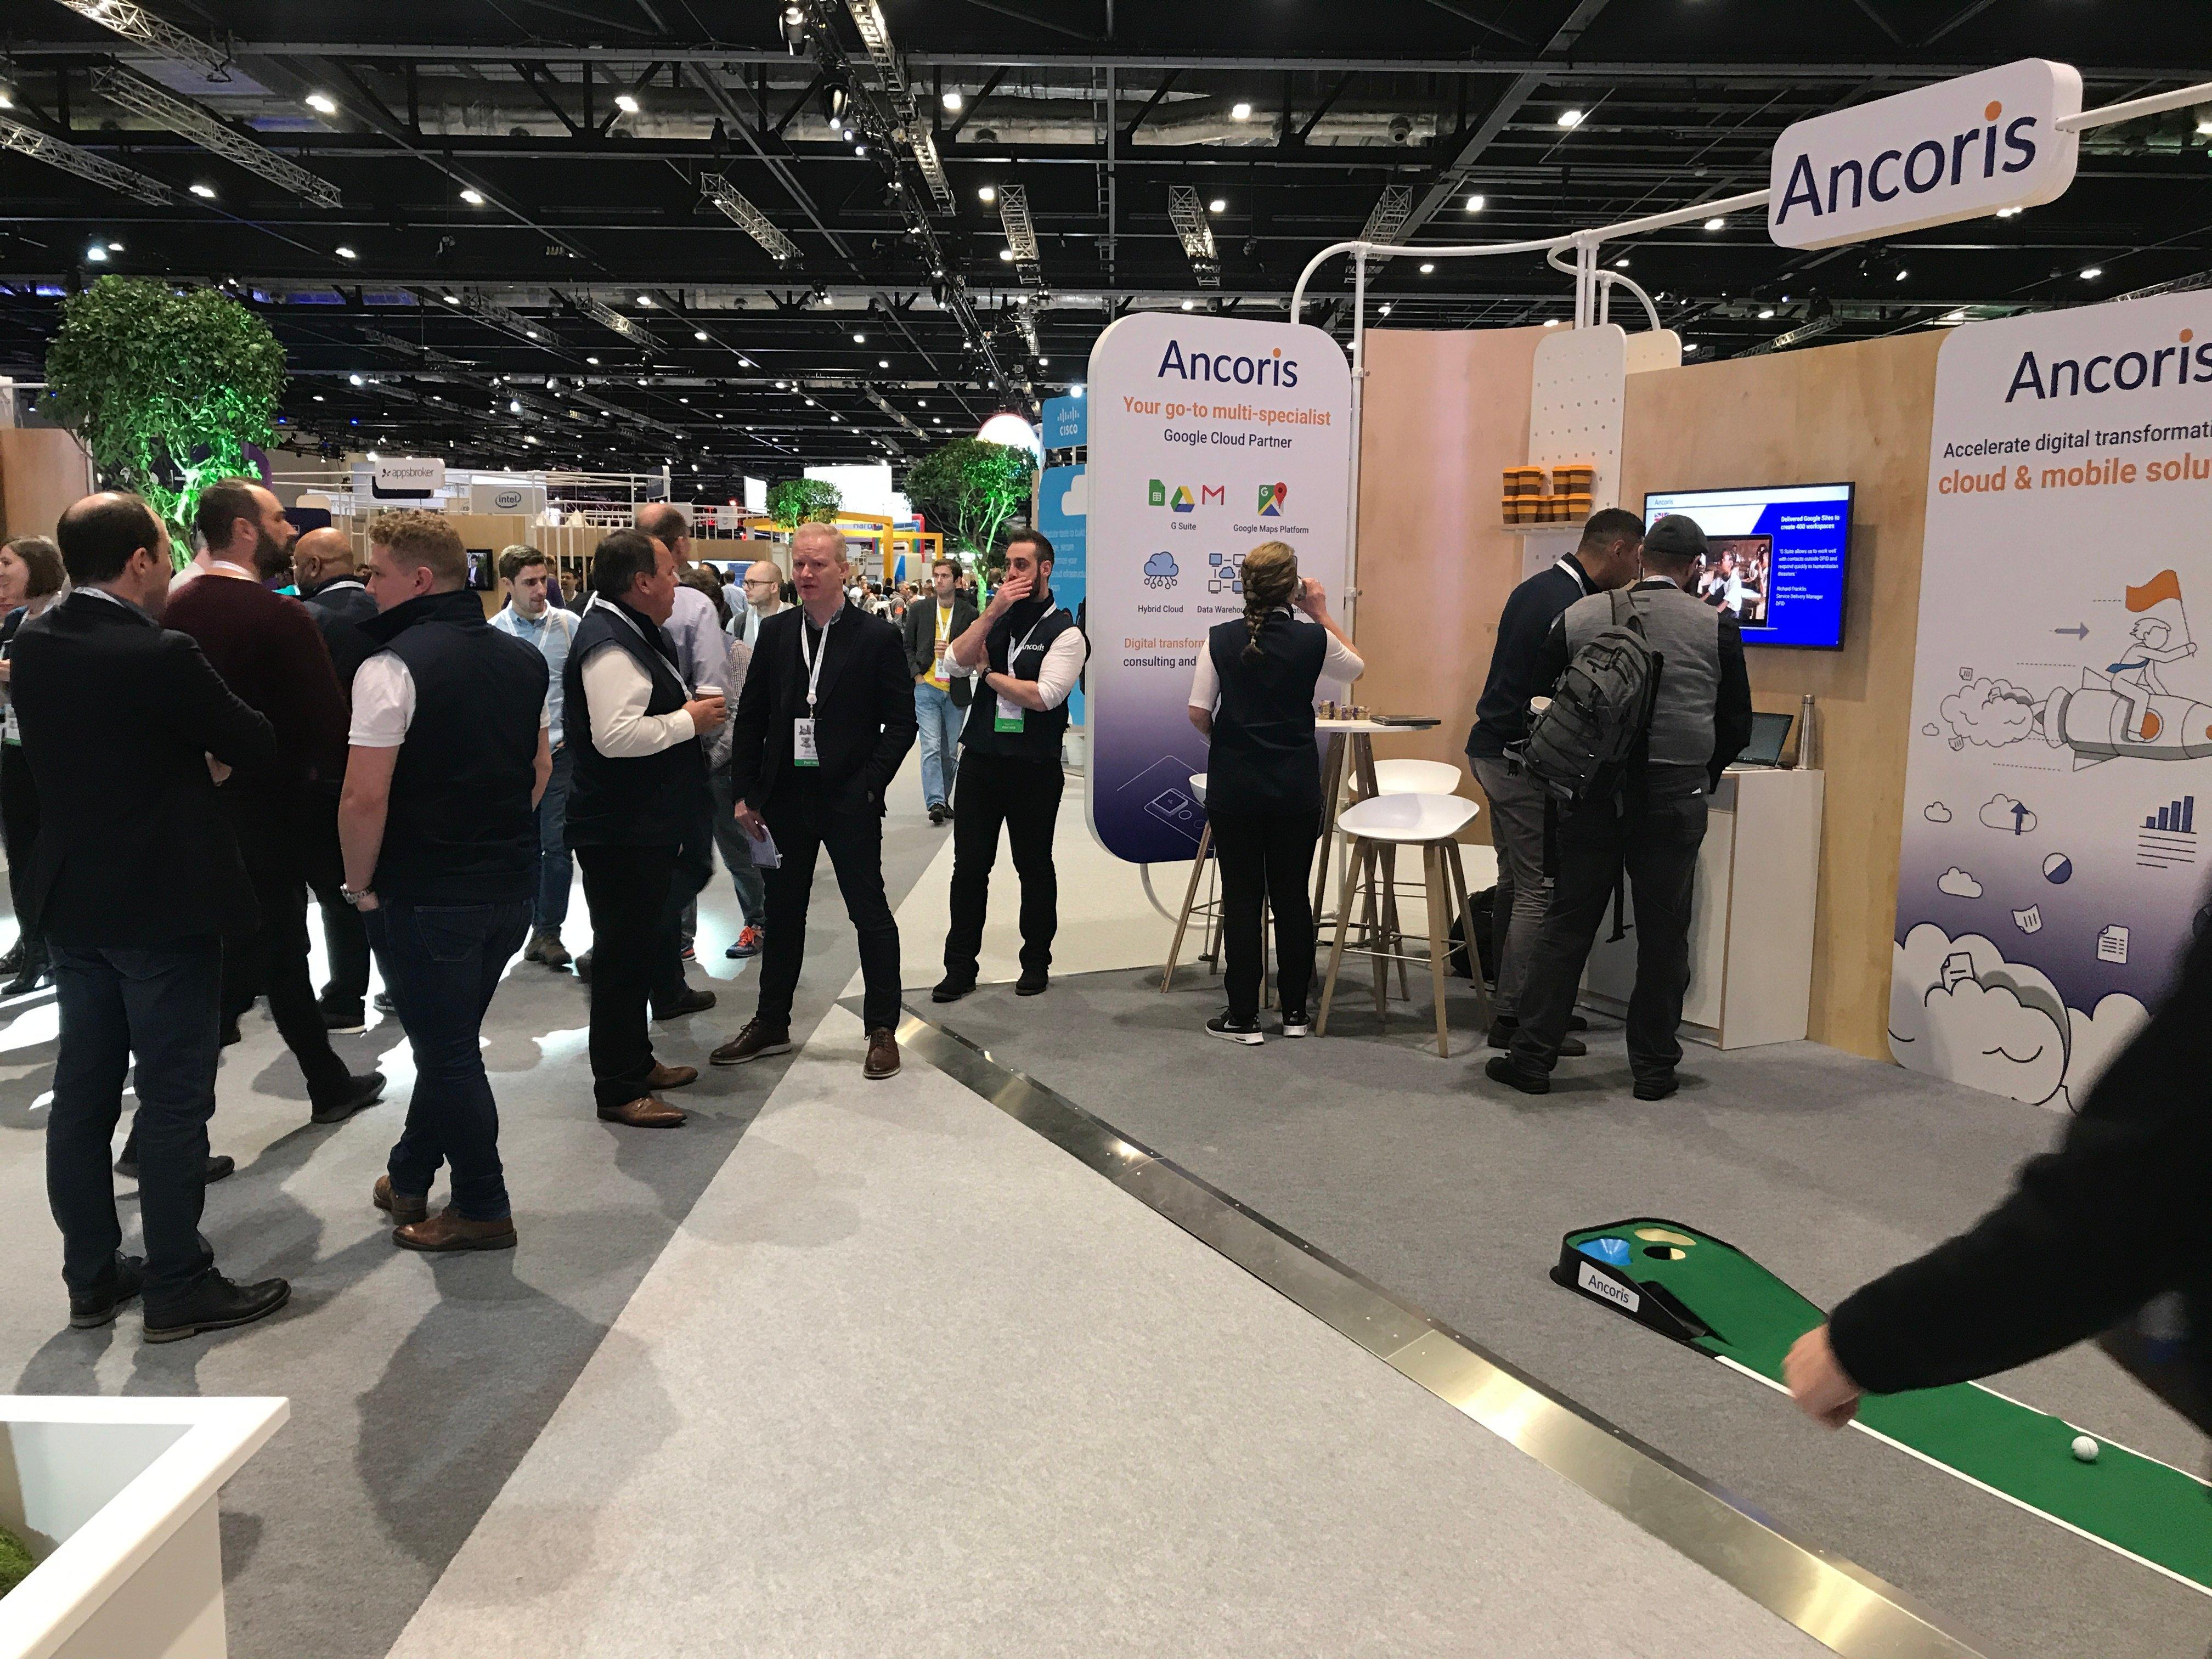 Ancoris stand at Google Next 19